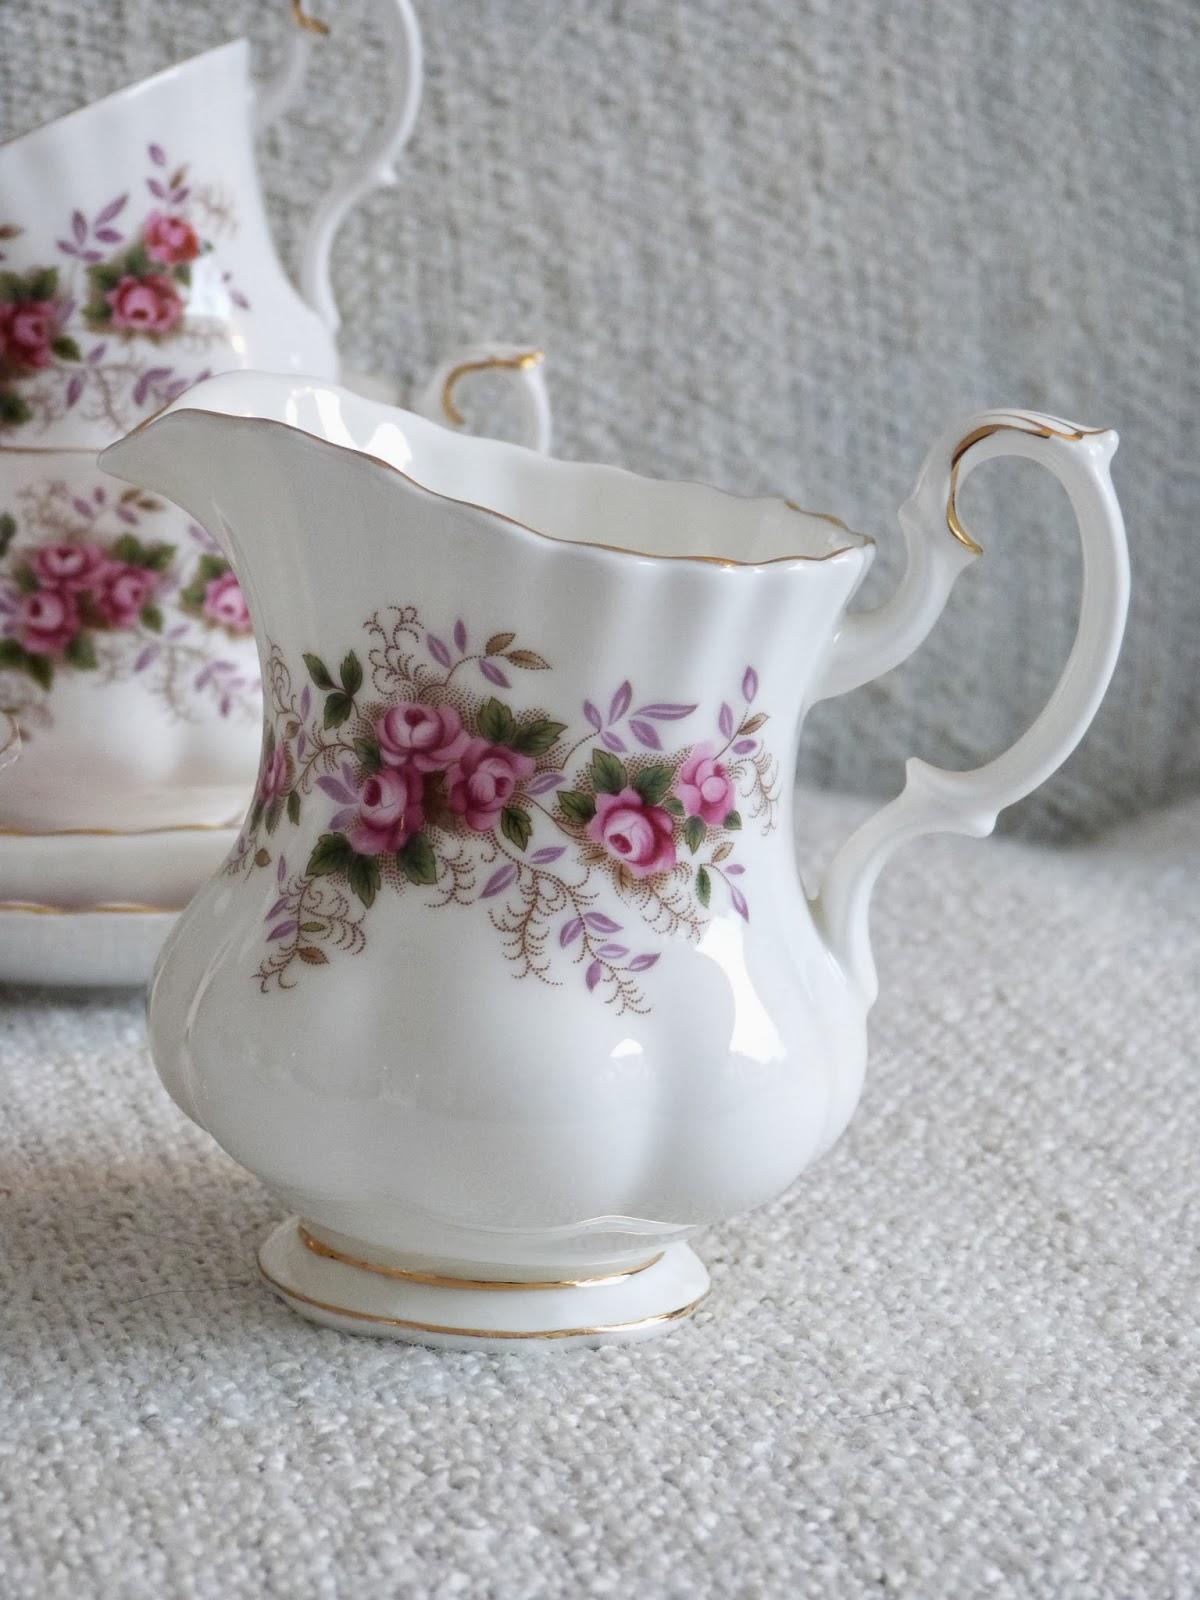 Royal Albert Servies Lavender Rose.Het Brocante Schelpenhuisje Lavender Rose